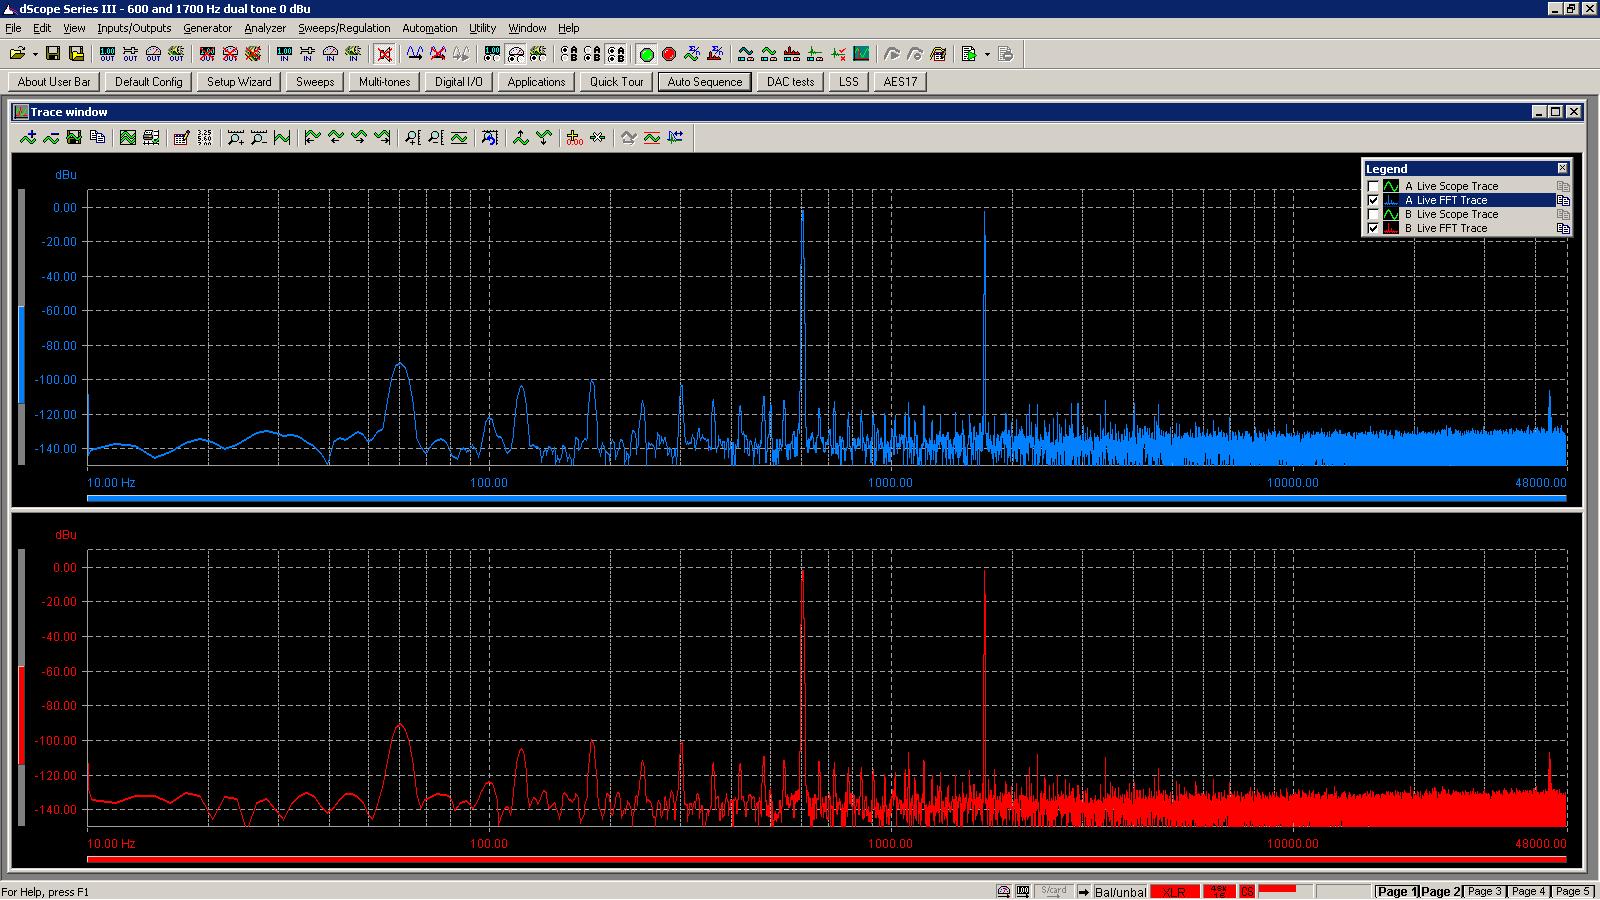 20160905 Jotunheim 600+1700Hz dual tone 0dBu 300R unBal.png